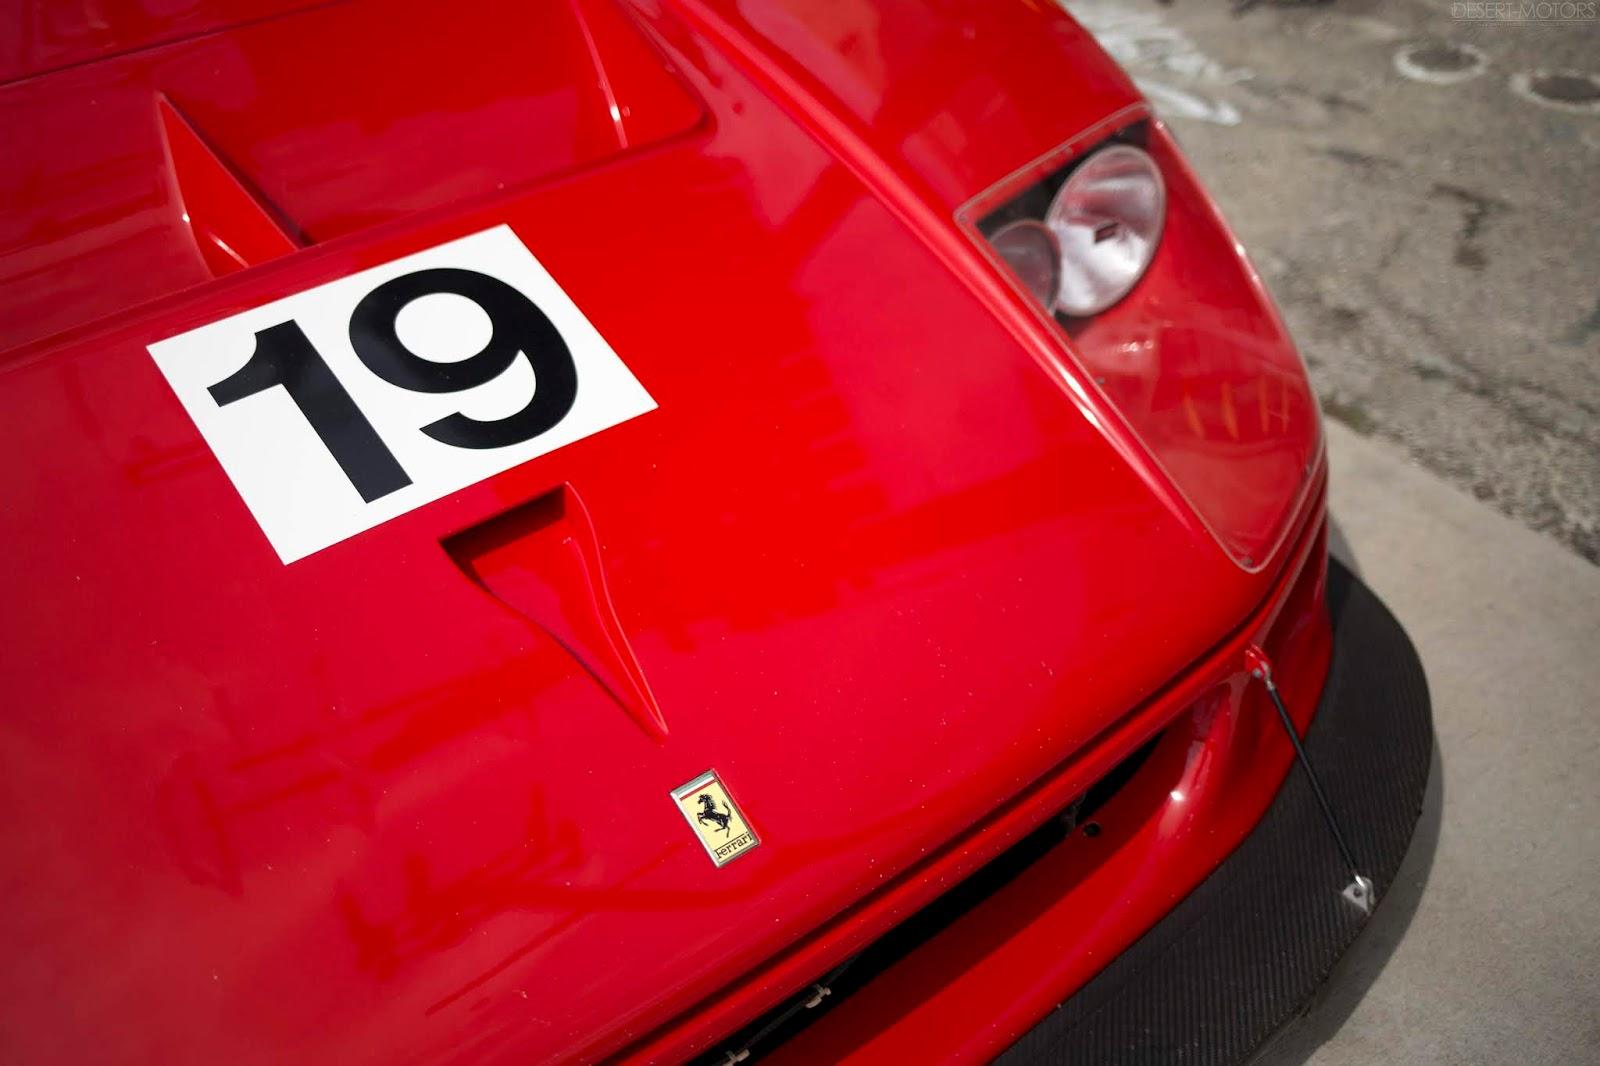 45258700771 2c065c0286 o F40. O μύθος, ο θρύλος F40, Ferrari, Ferrari F40, retrocar, retrocar sunday, zblog